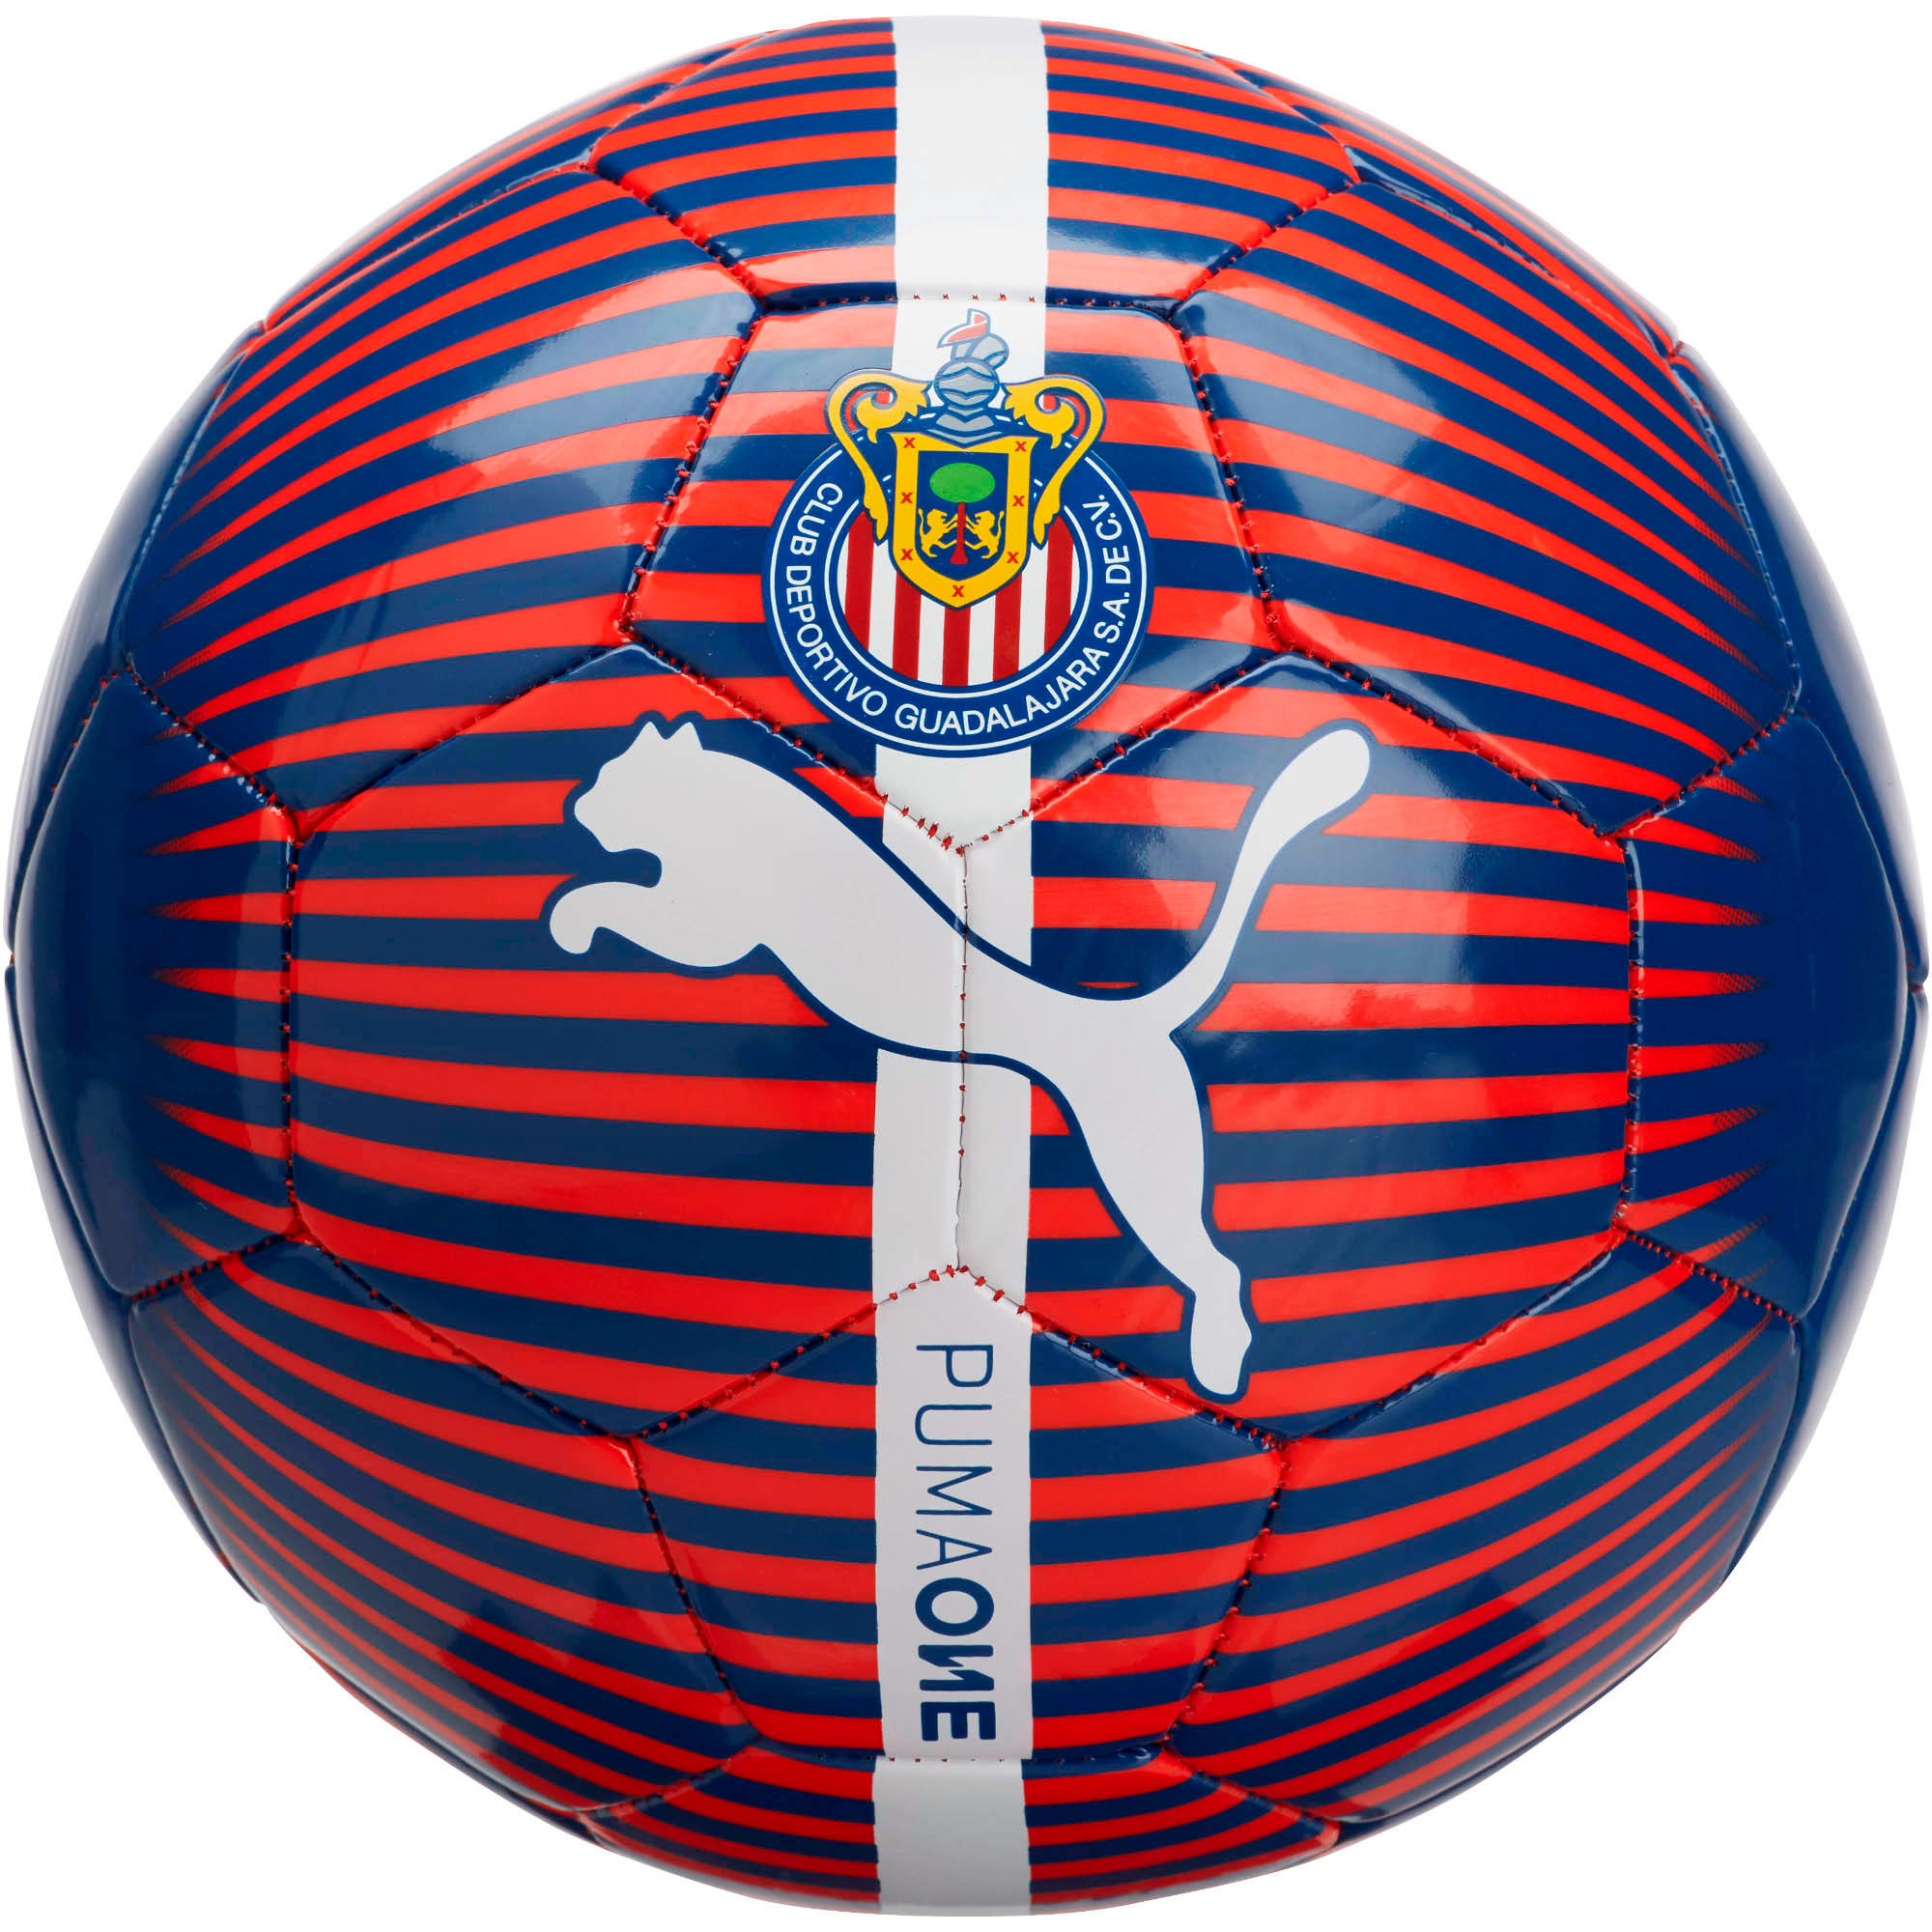 Thumbnail 1 of Chivas Puma ONE ball, New Navy-Puma Red-White, medium